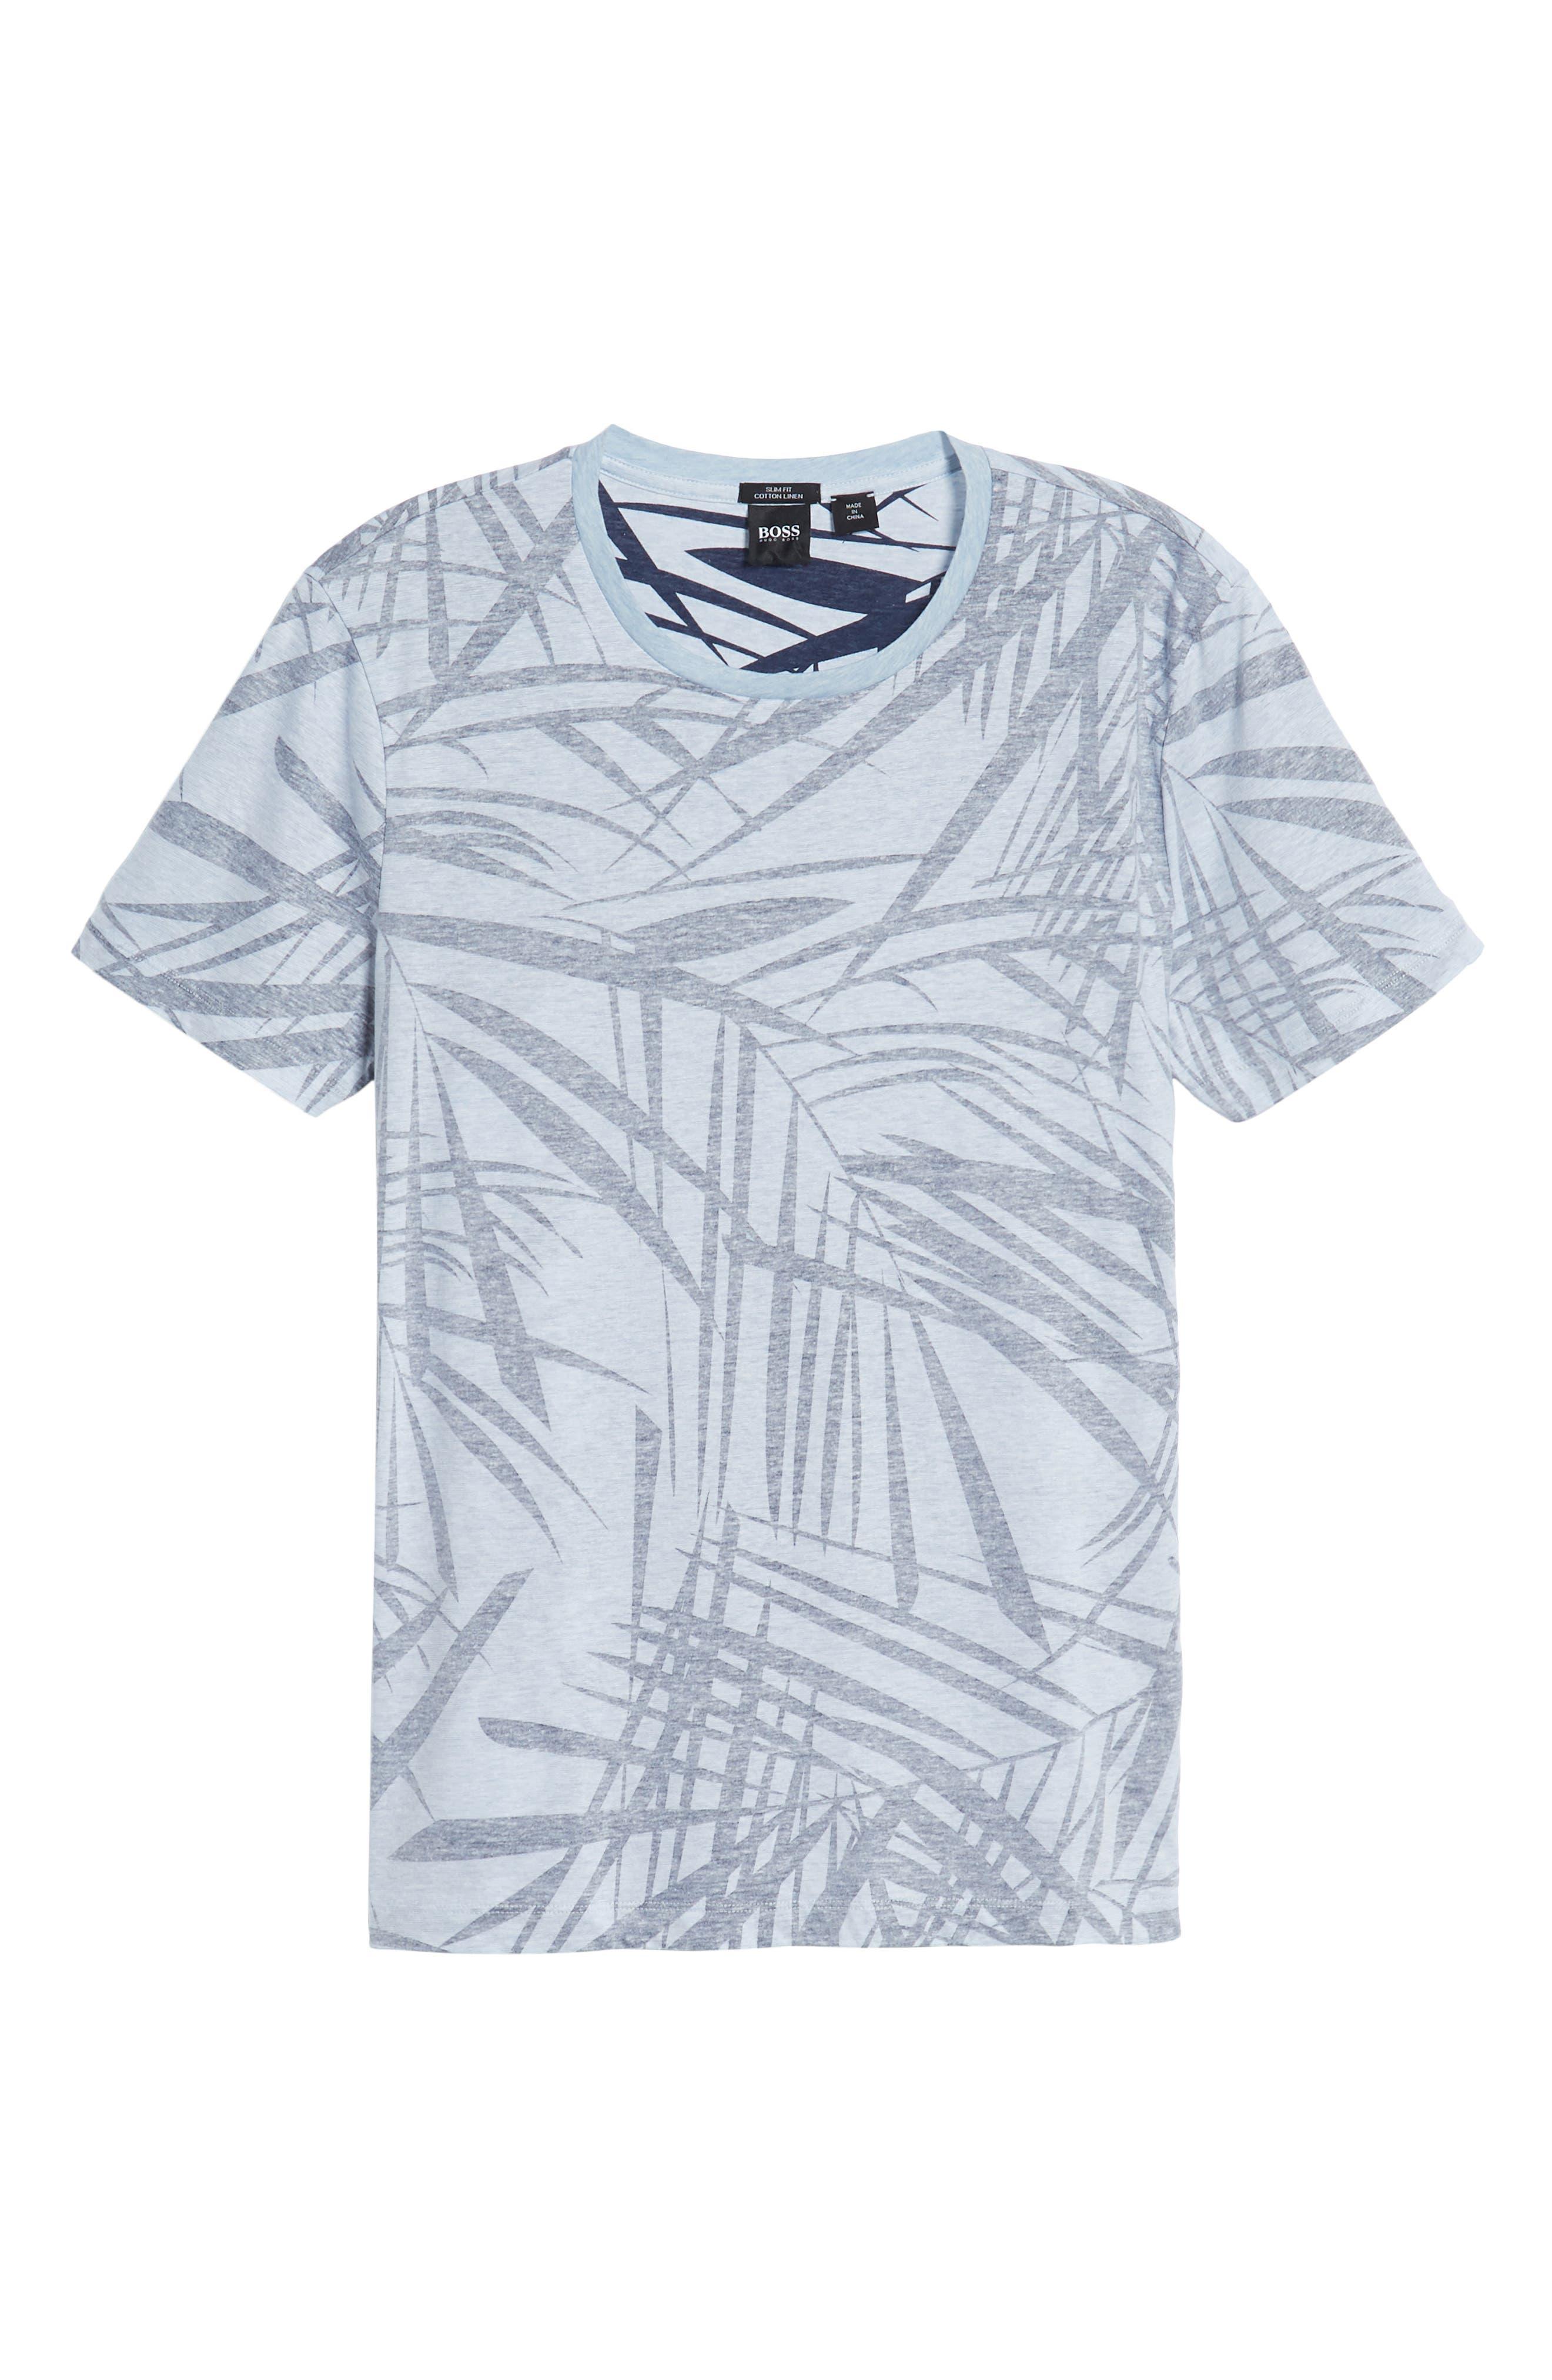 Tessler Crewneck T-Shirt,                             Alternate thumbnail 6, color,                             BLUE